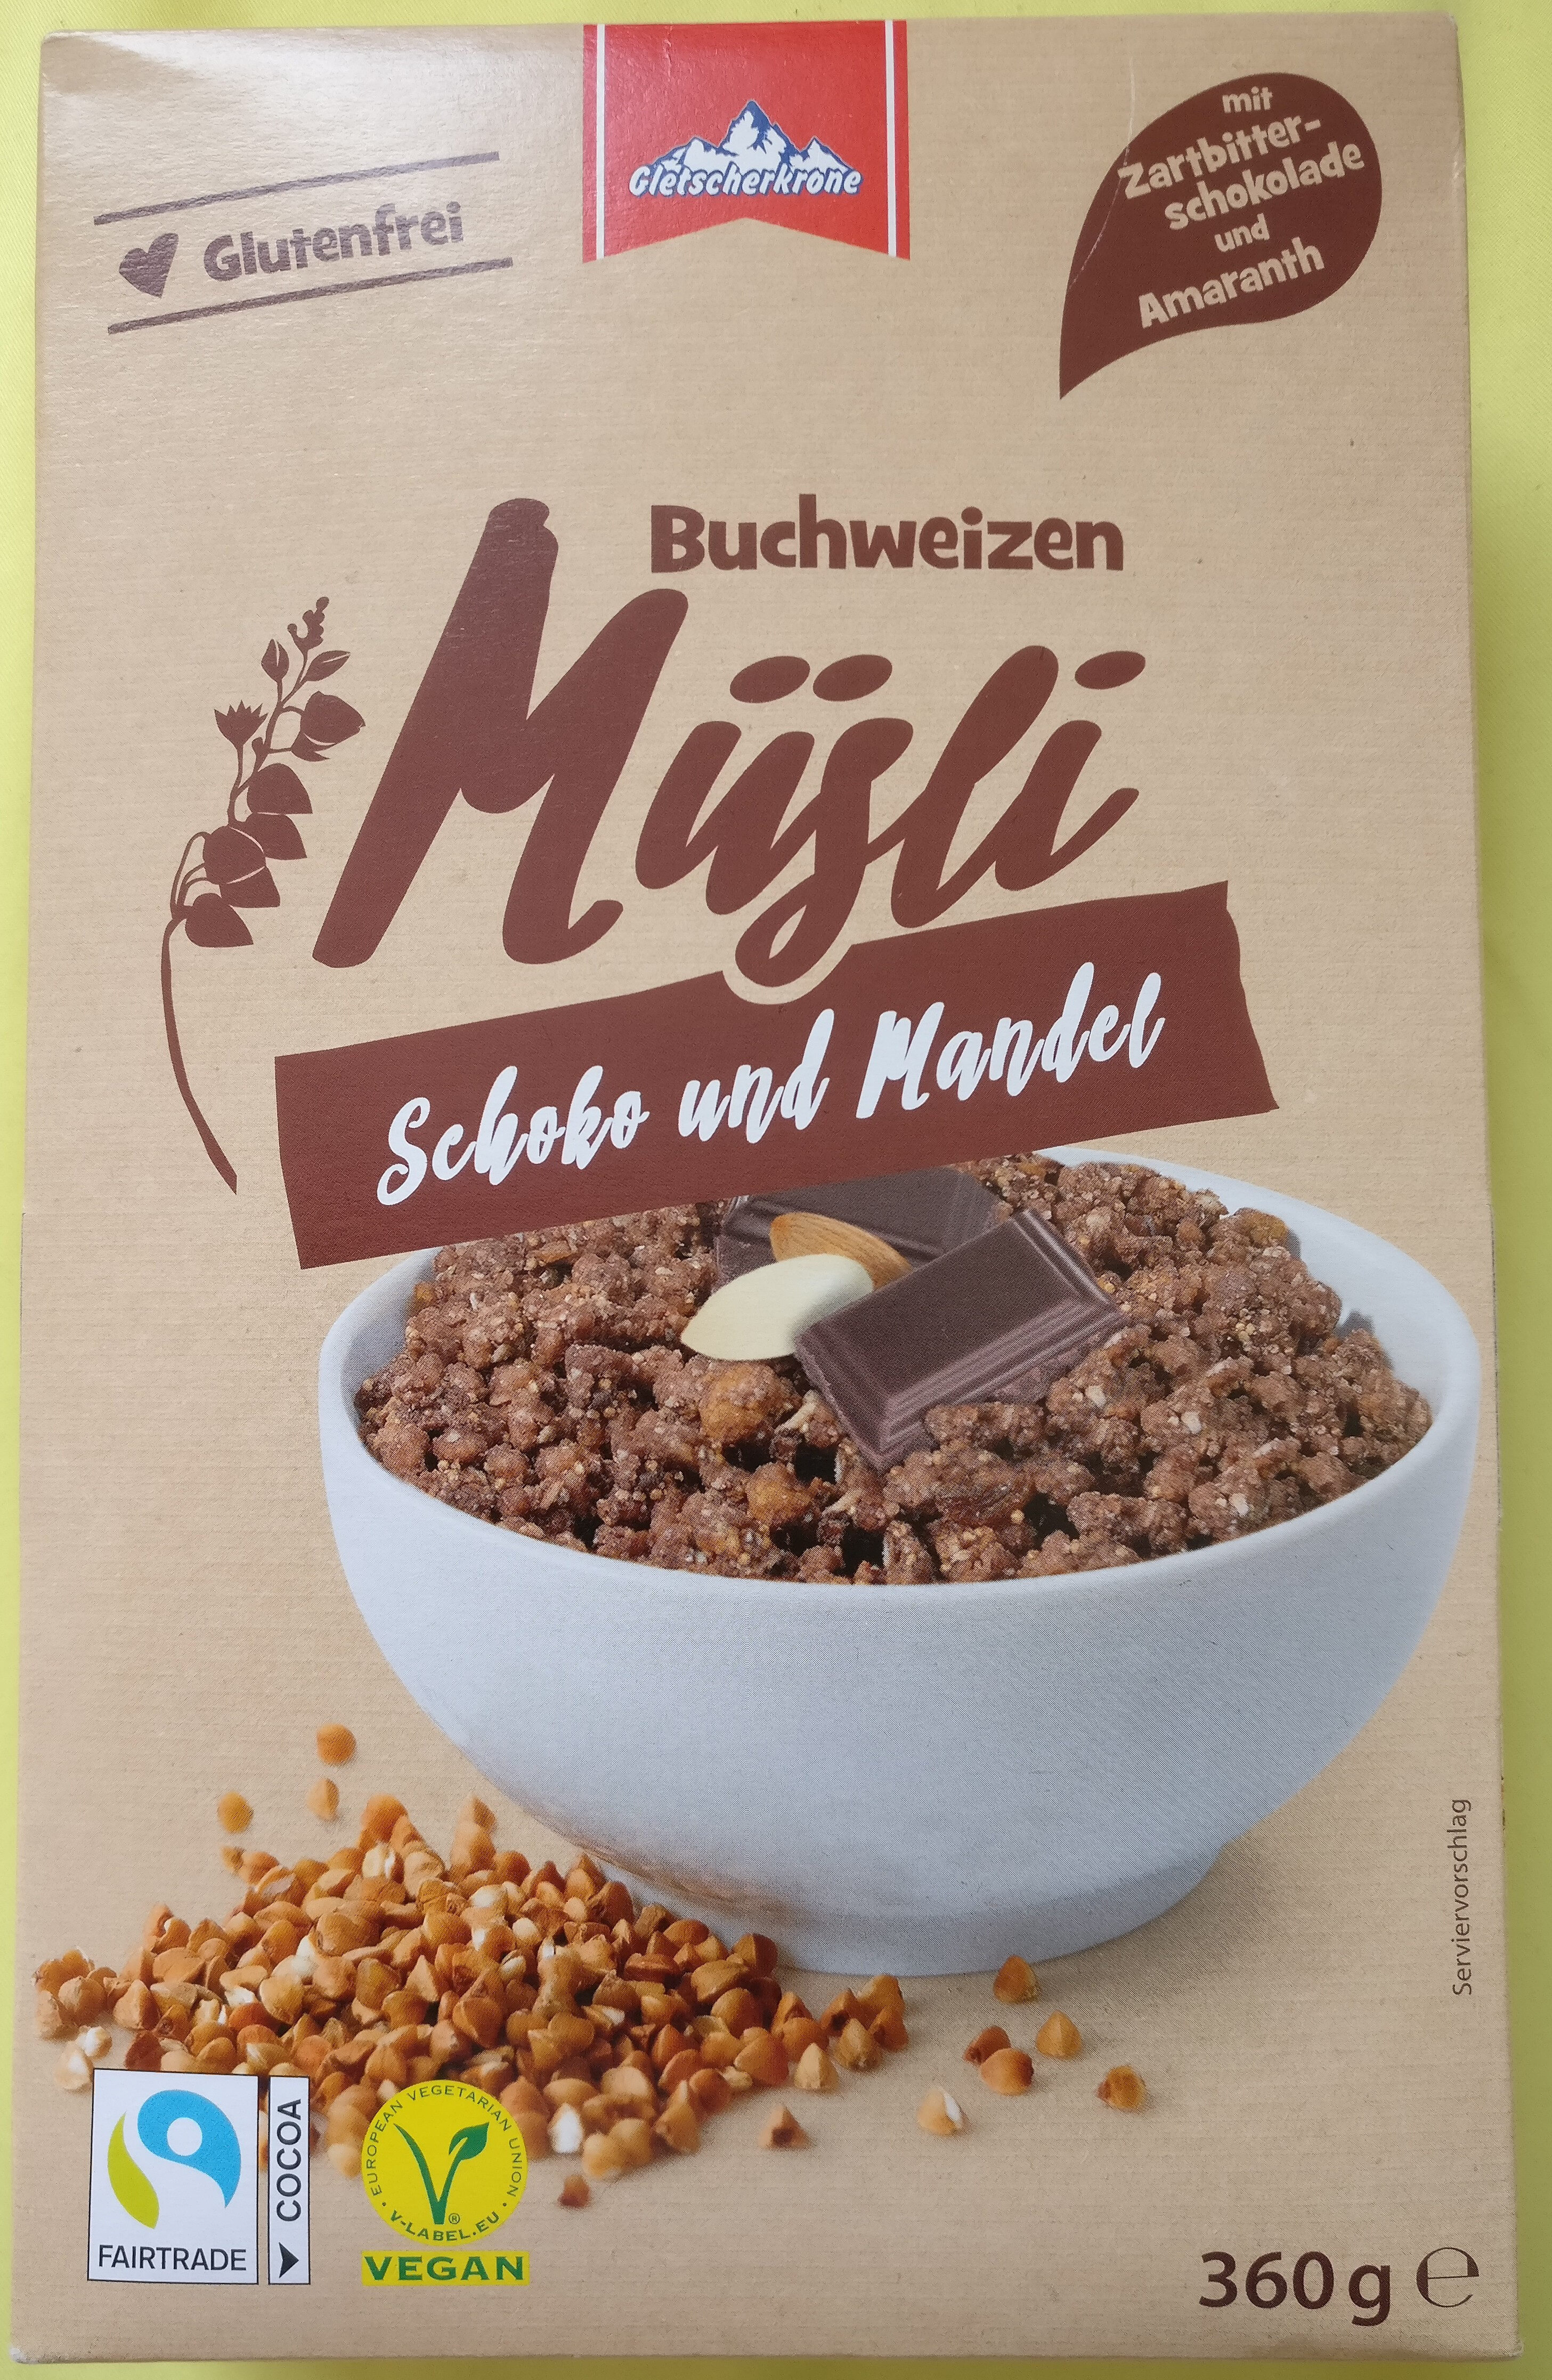 Buchweizen Müsli Schoko und Mandel - Product - de